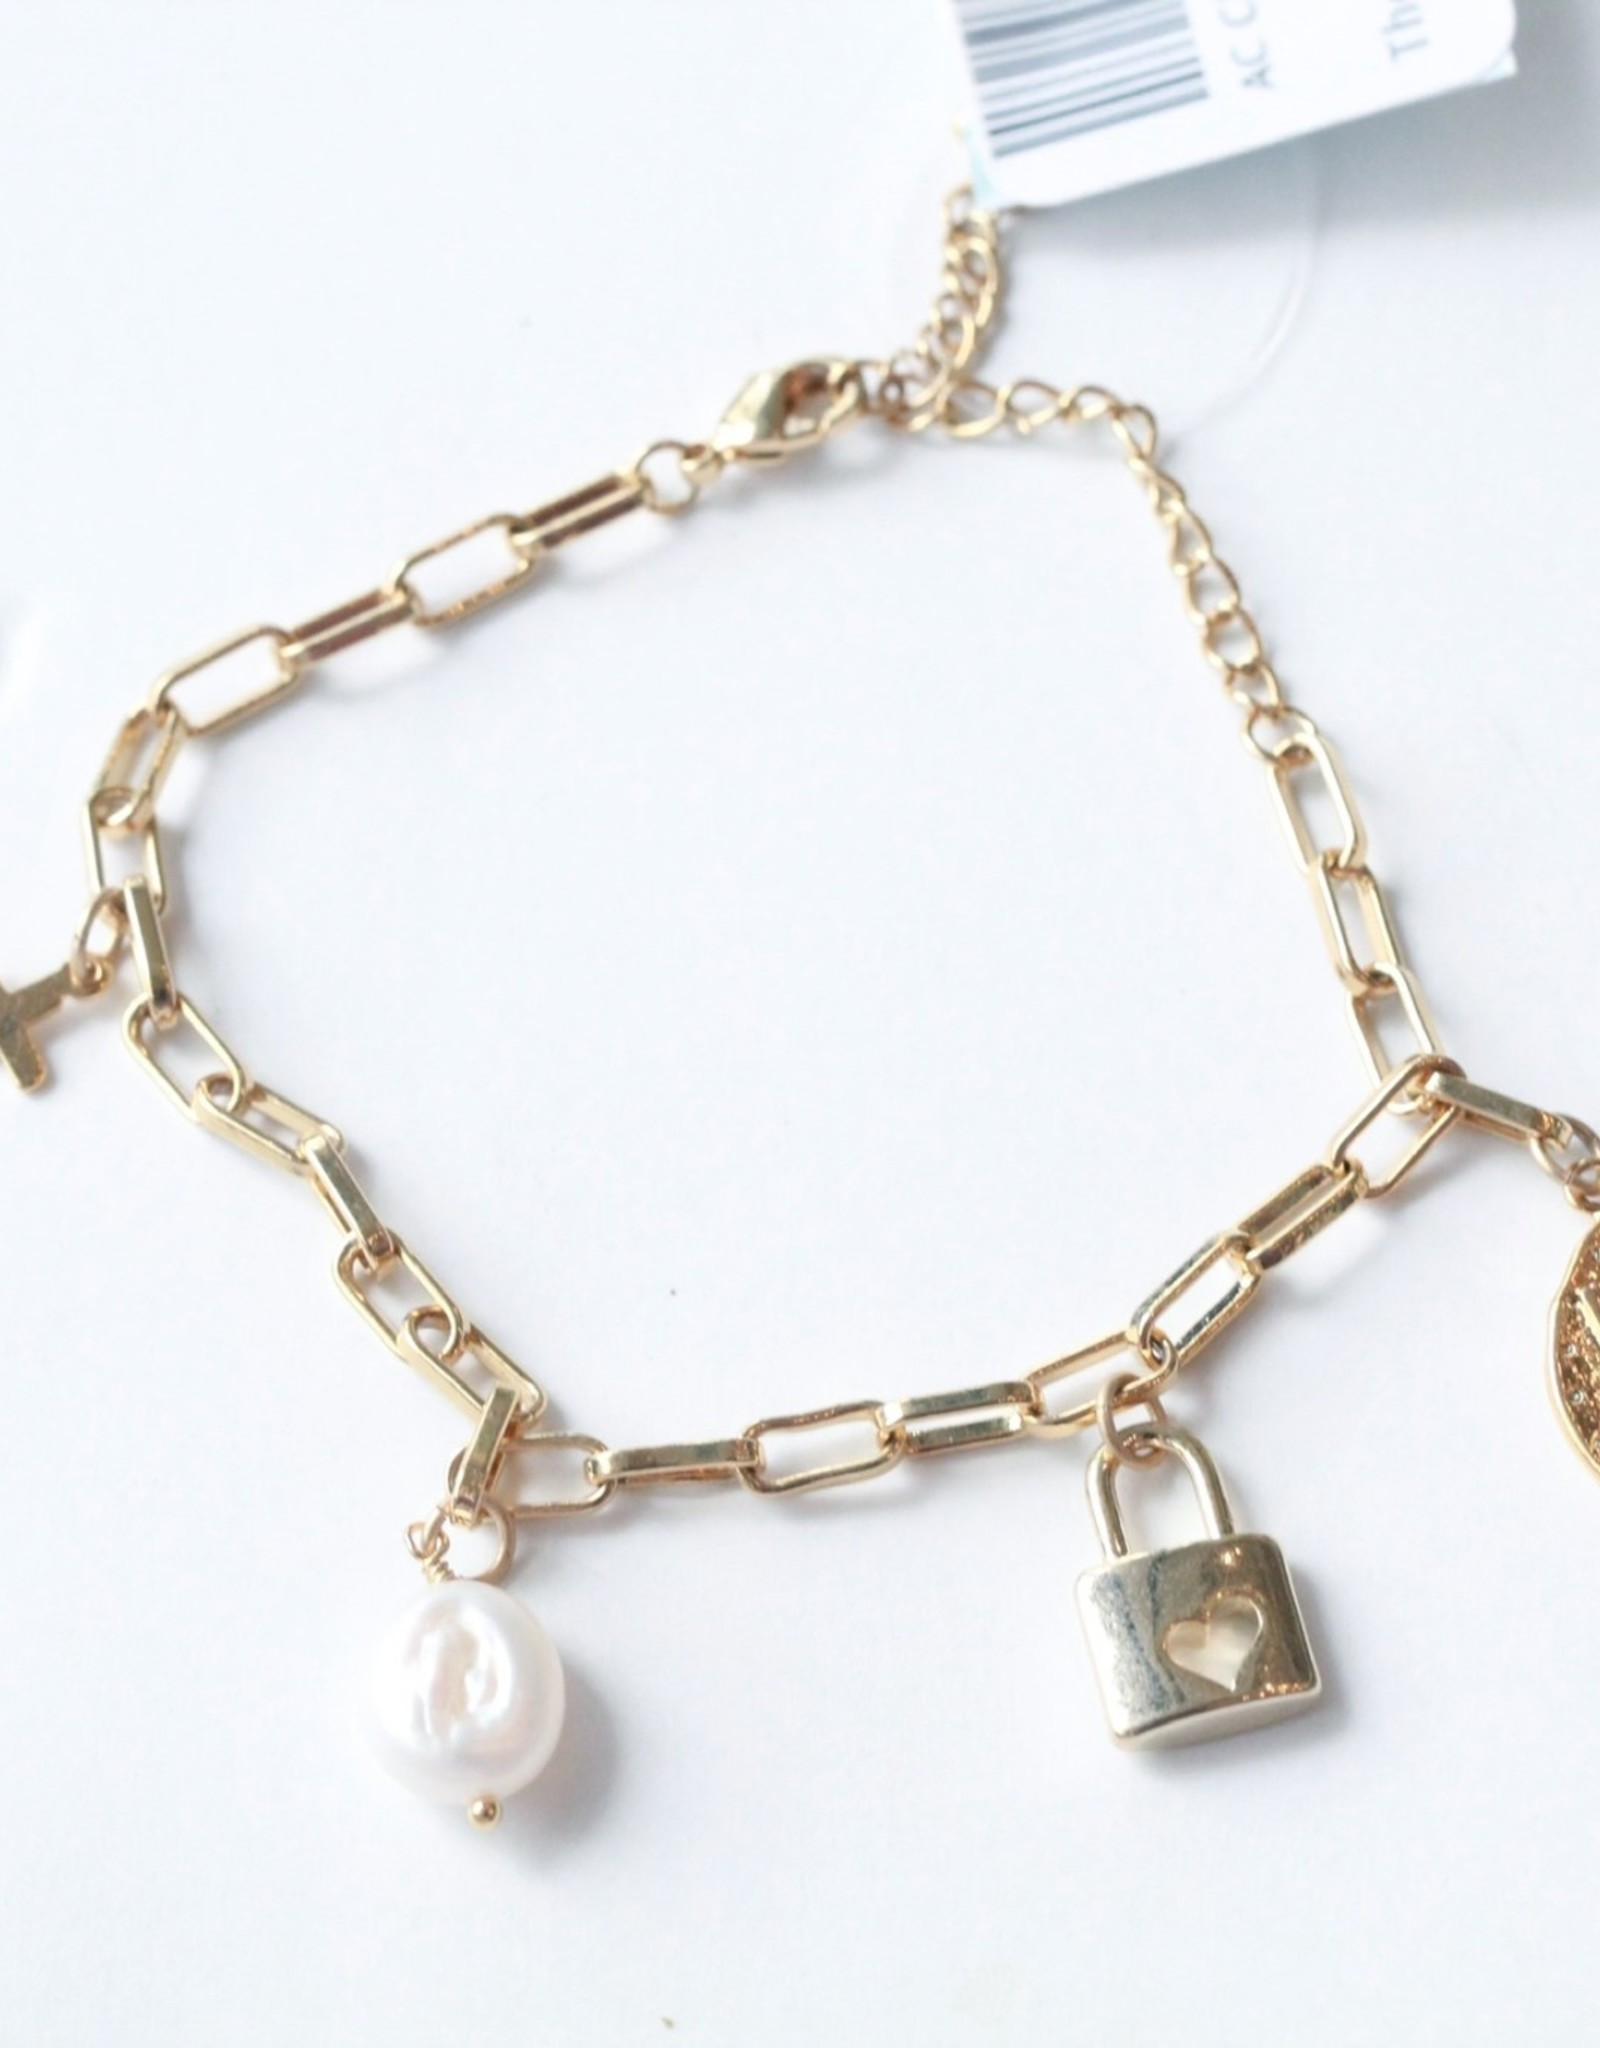 Allison Conway AC Bee Mine Charm Bracelet